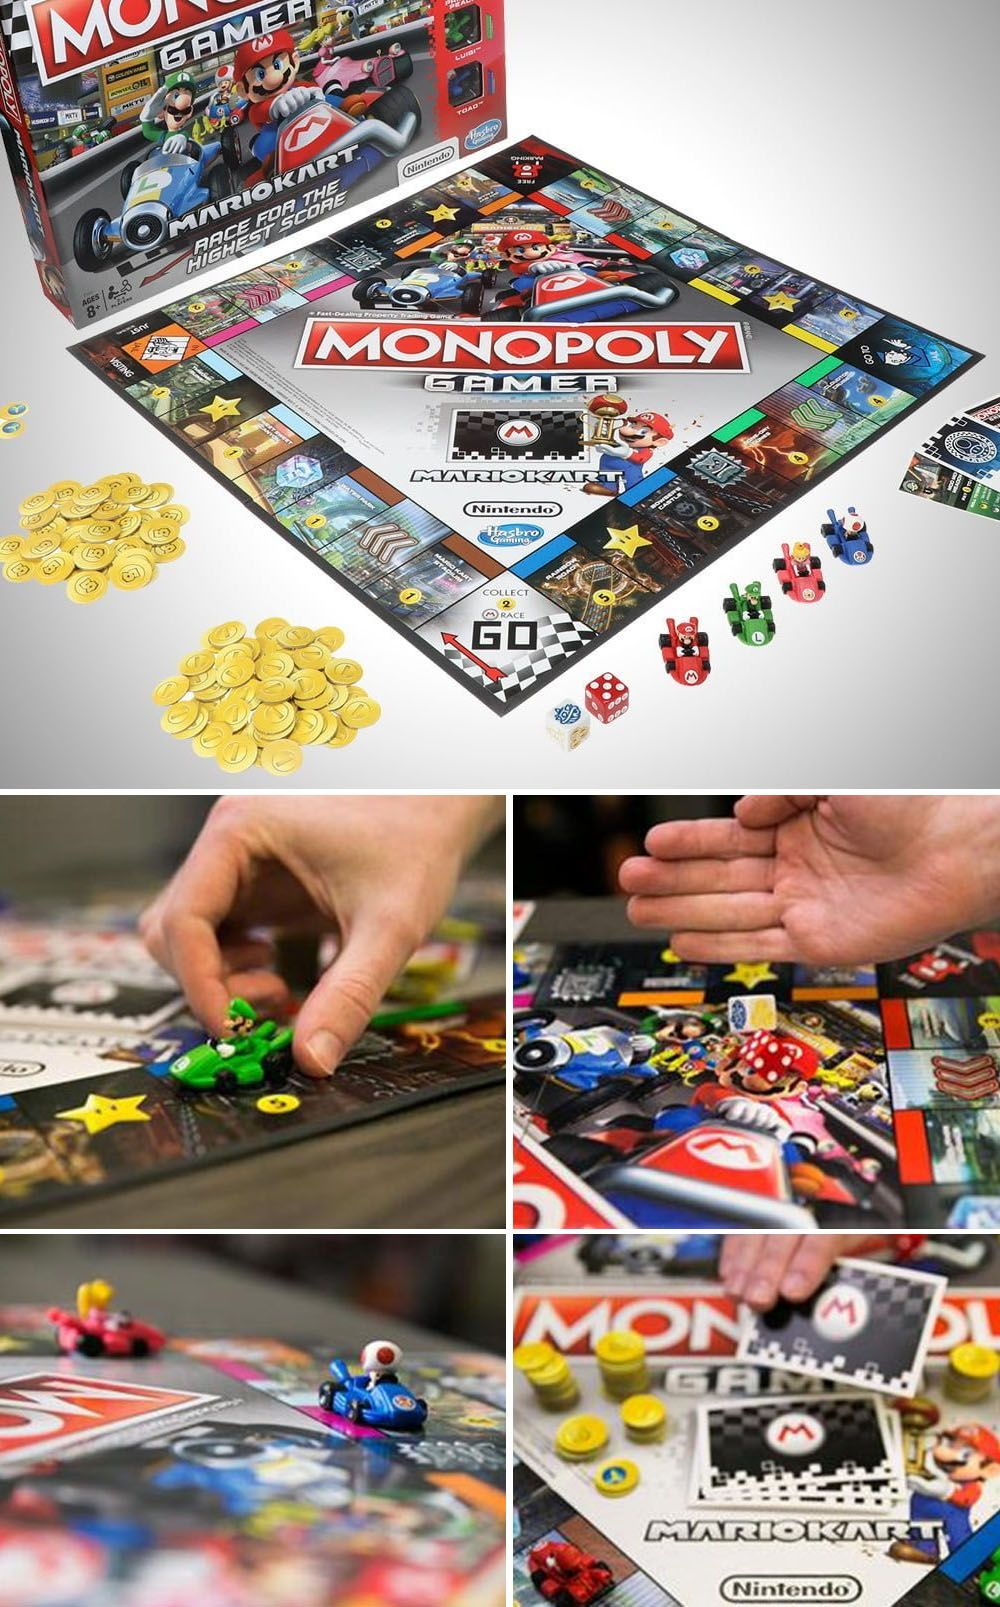 Mario Kart Monopoly Nerdy Things Mario Kart Games Mario